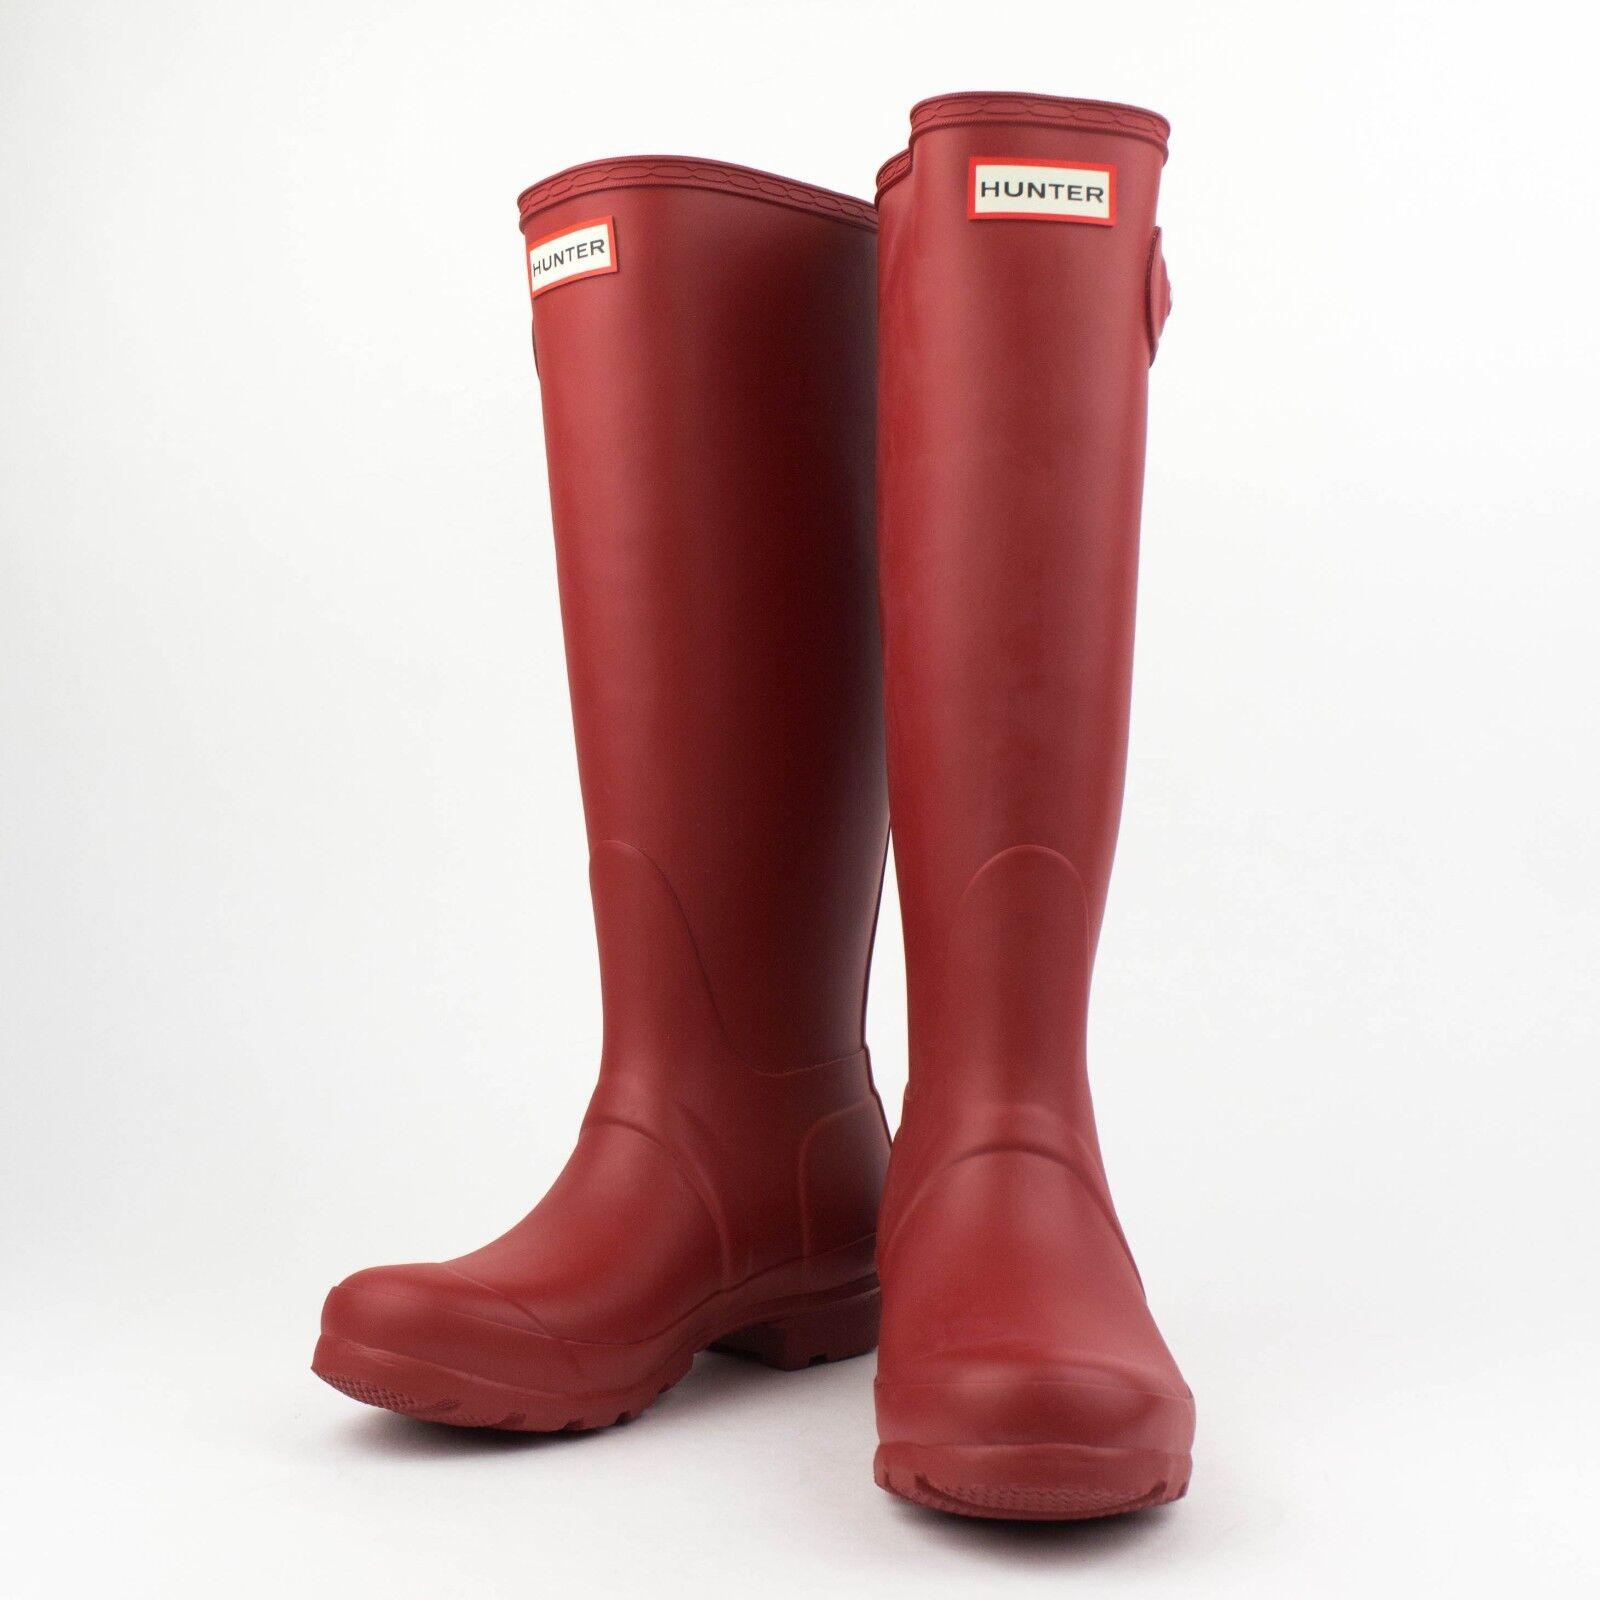 NIB HUNTER Military Rosso Original Tour Tall Rain Boots Shoes Size US 9 EU 40